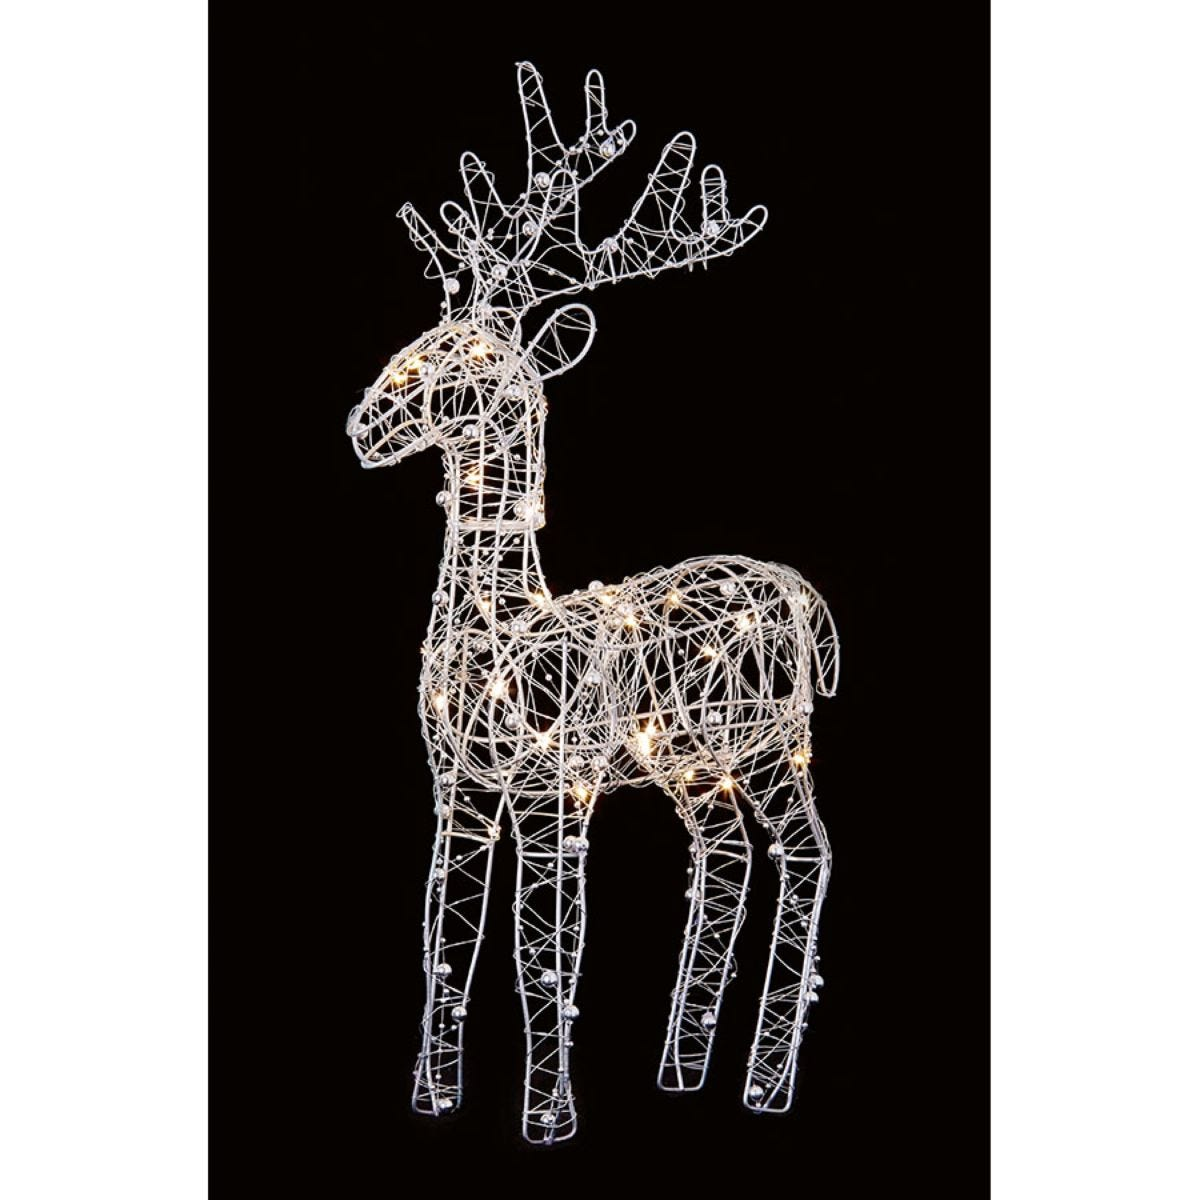 Premier Decorations Ltd Wire Reindeer with 30 LEDs - 45cm